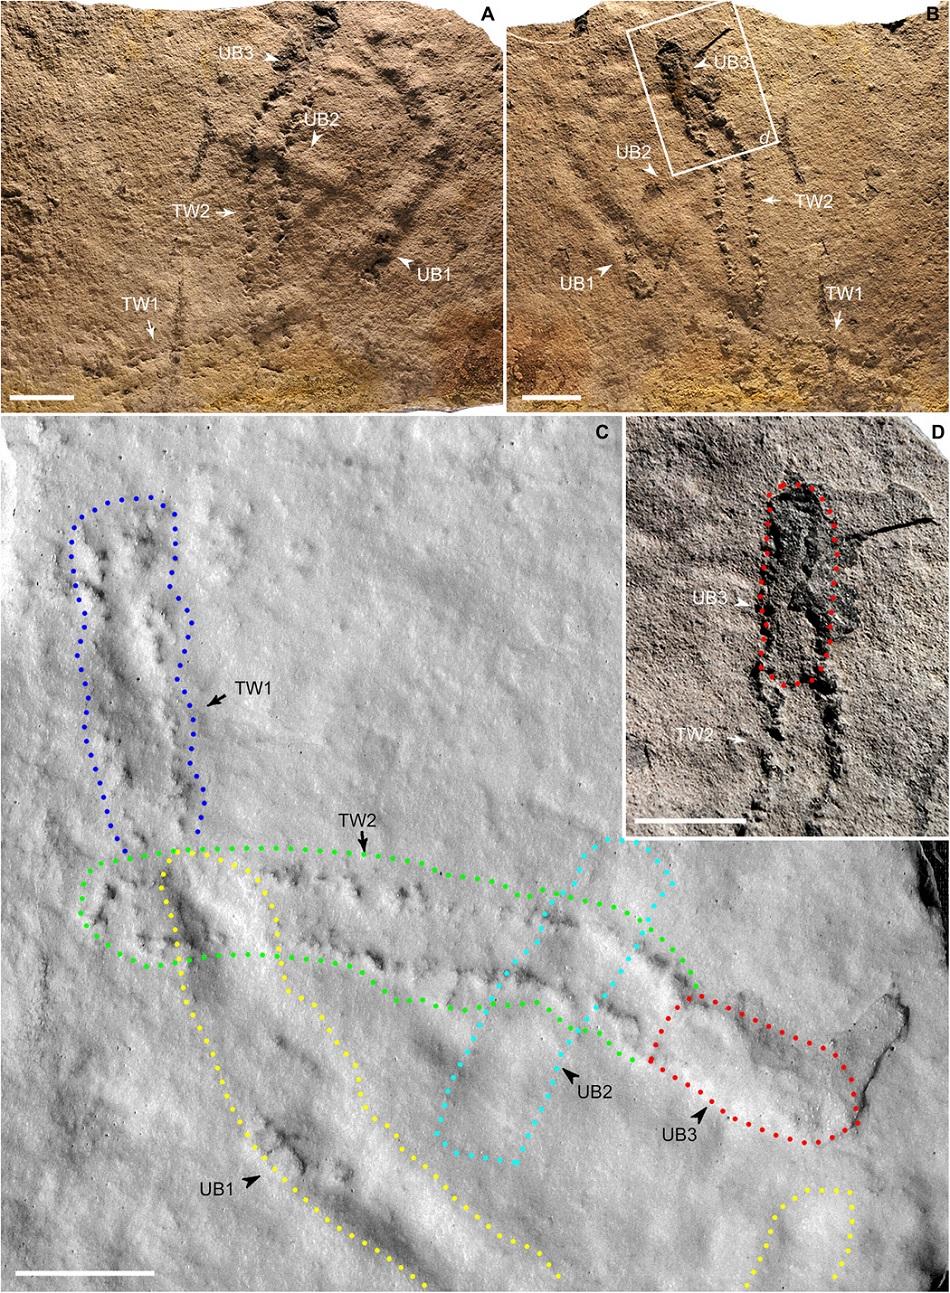 Zkamenělé otisky stop neznámého ediakarského tvora, foto Zhe Chen et al., Late Ediacaran trackways produced by bilaterian animals with paired appendages, Science Advances  06 Jun 2018:, Vol. 4, no. 6, eaao6691, DOI: 10.1126/sciadv.aao6691, CC BY-NC 4.0, https://creativecommons.org/licenses/by-nc/4.0/.